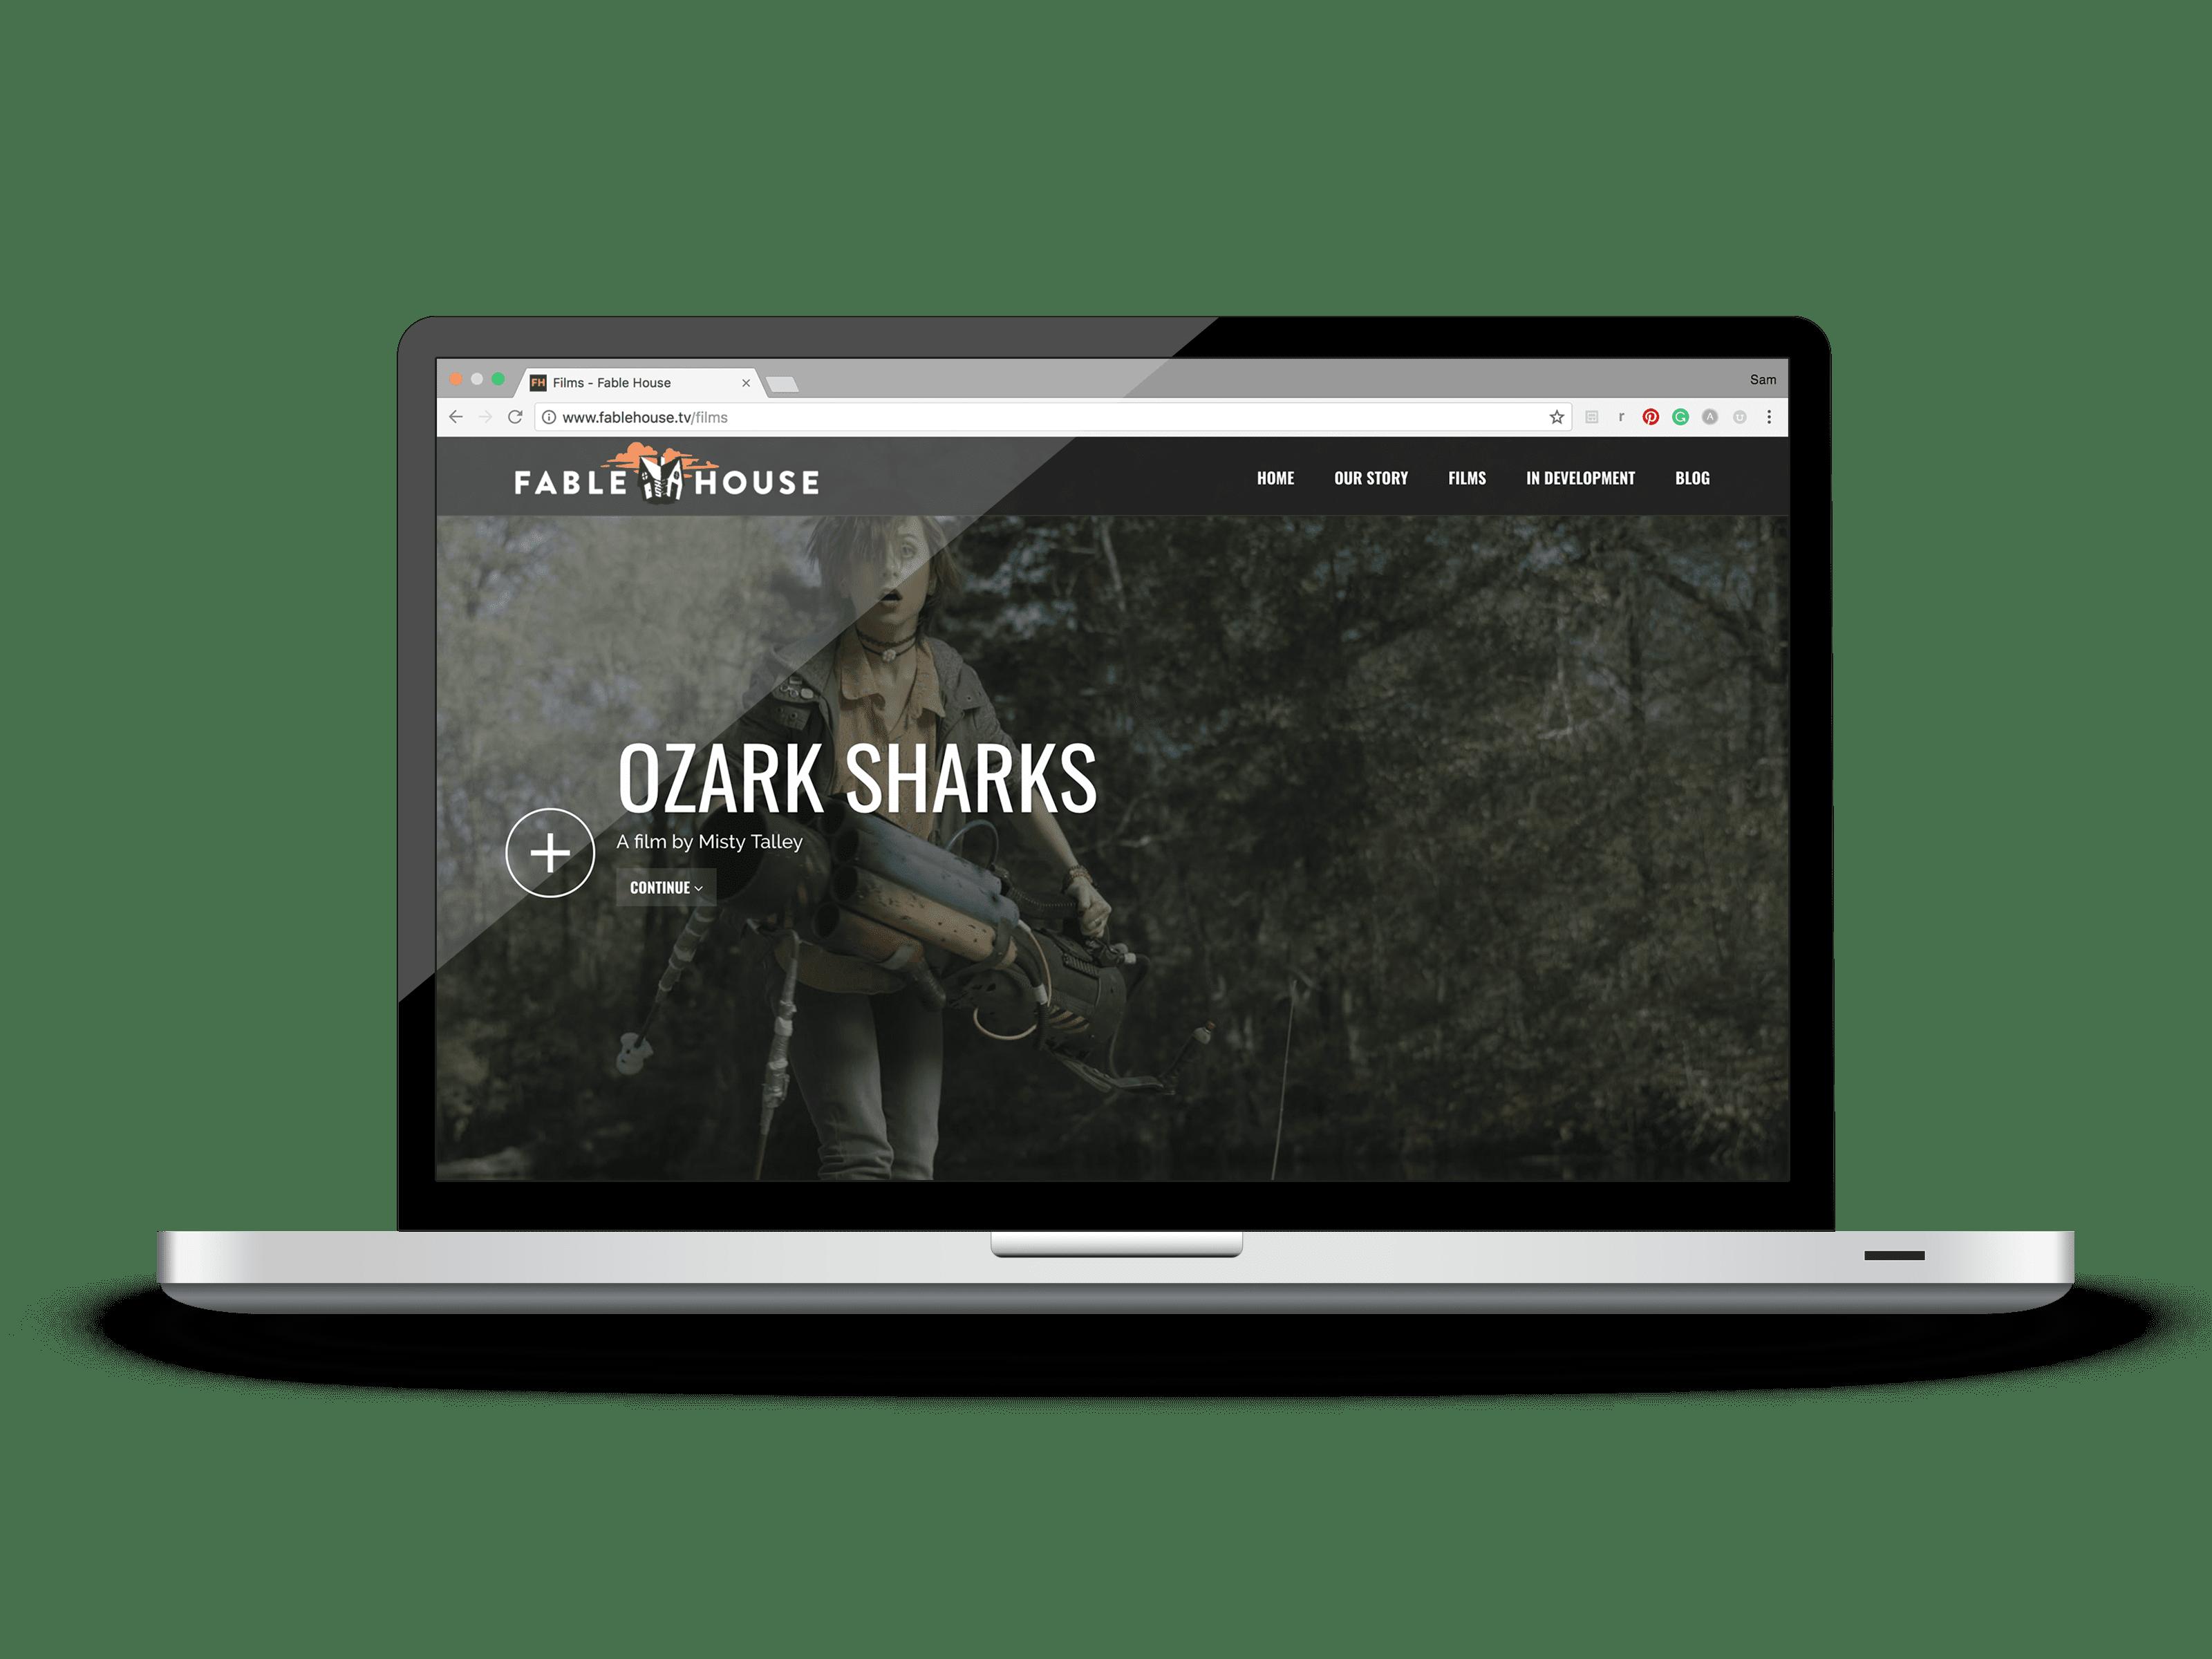 Website Design and Development in Baton Rouge LA